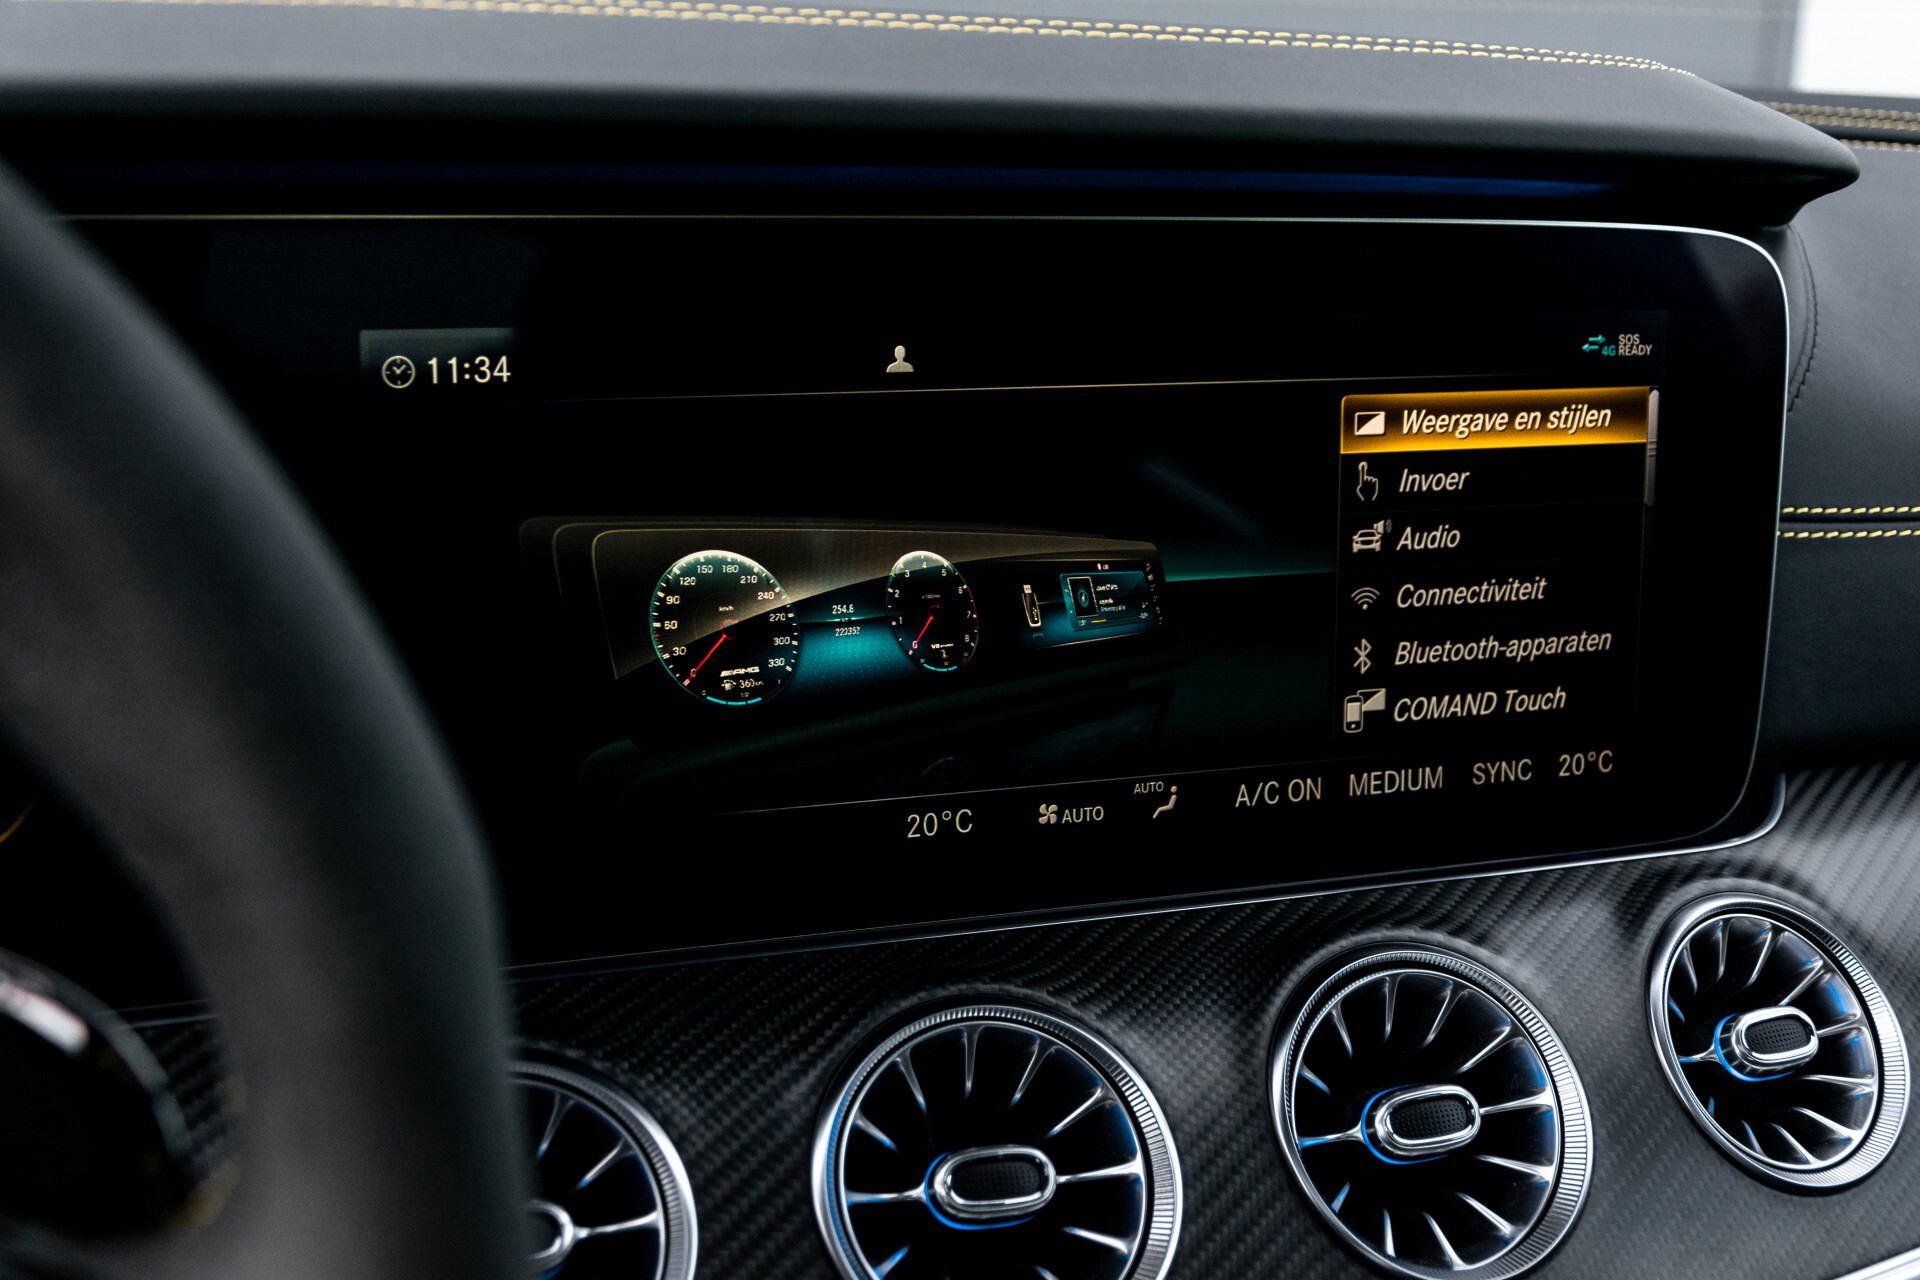 Mercedes-Benz AMG GT 4-Door Coupe 63 S 4MATIC+ Edition 1 Keramisch/Carbon/First Class/Dynamic Plus/Burmester High End 3D Aut9 Foto 45